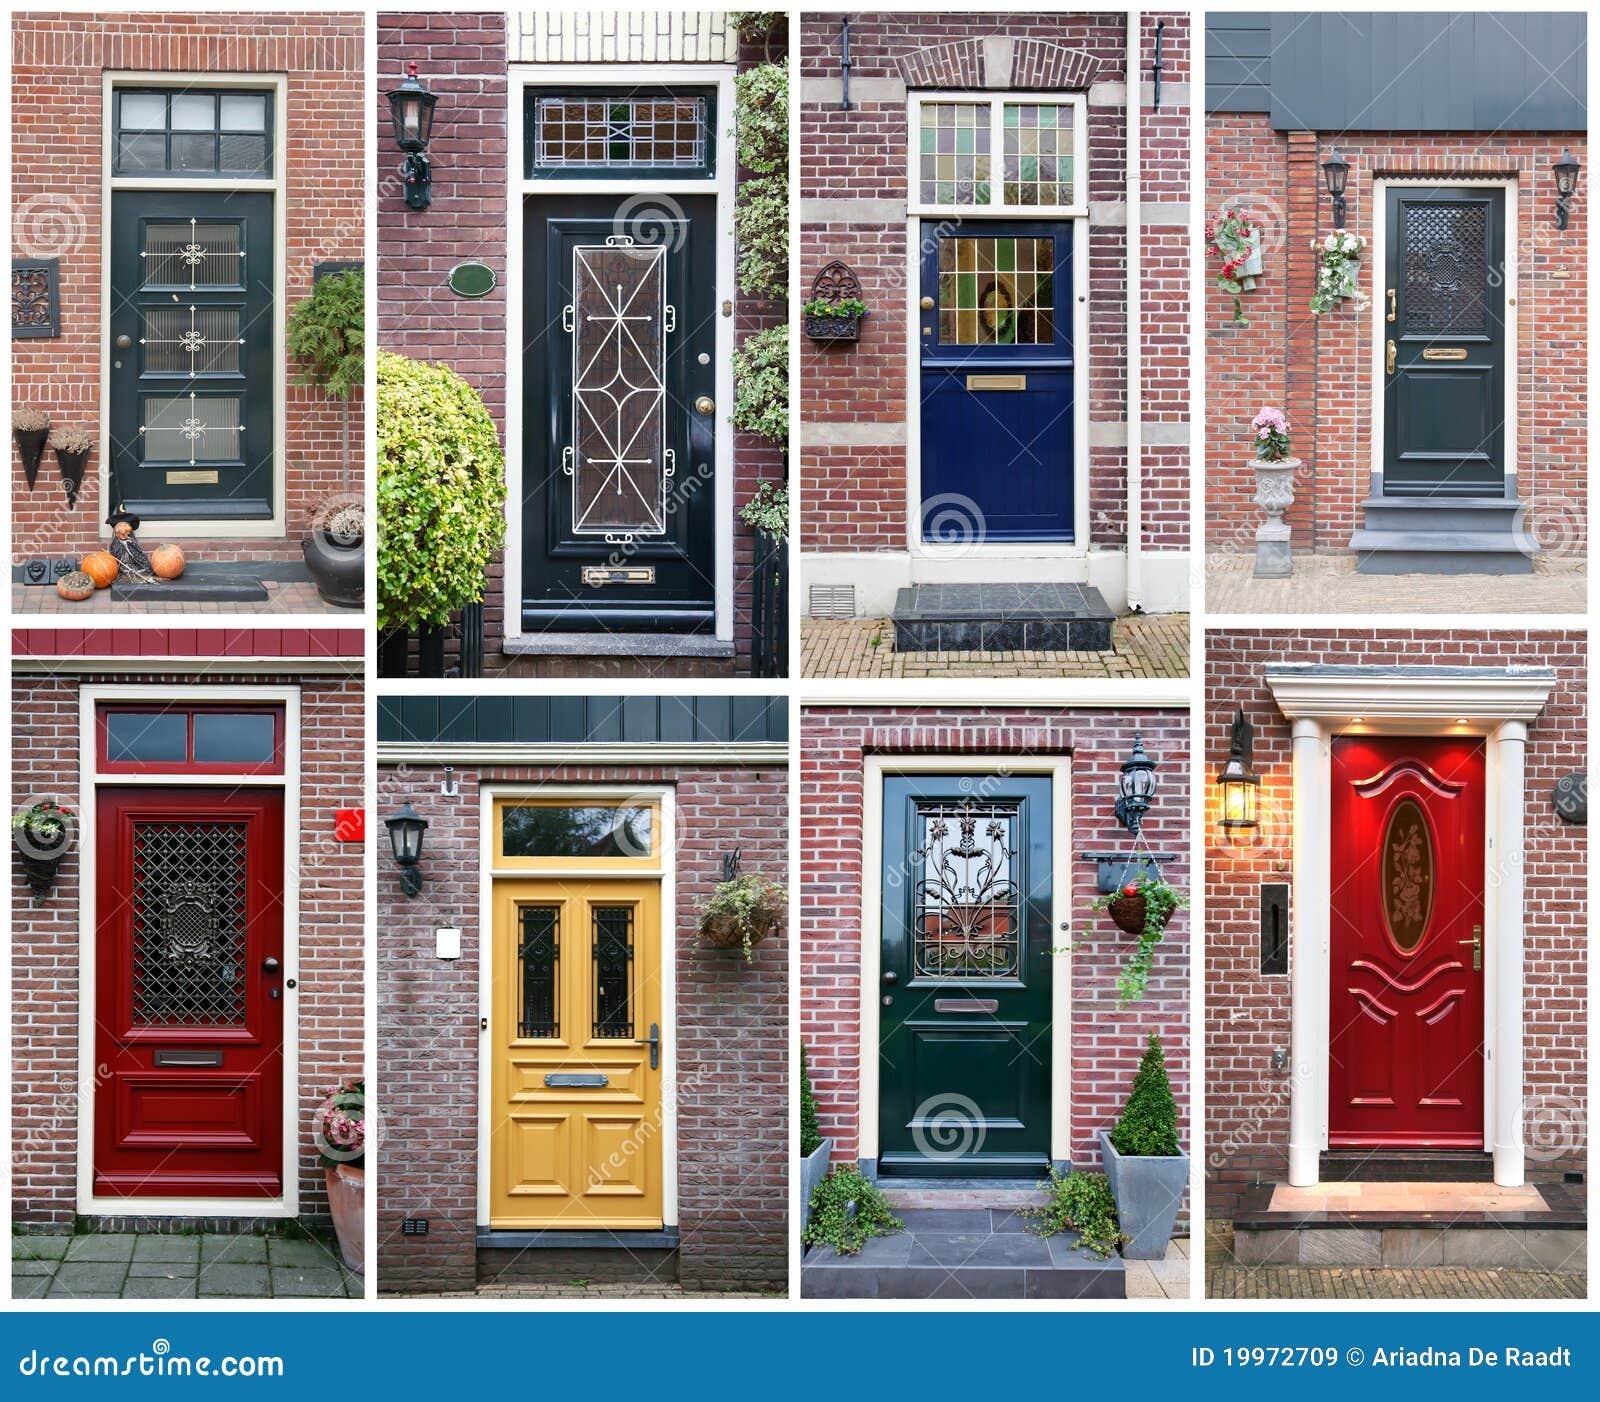 collage door ... & Front Door Background Royalty Free Stock Images - Image: 19972709 Pezcame.Com